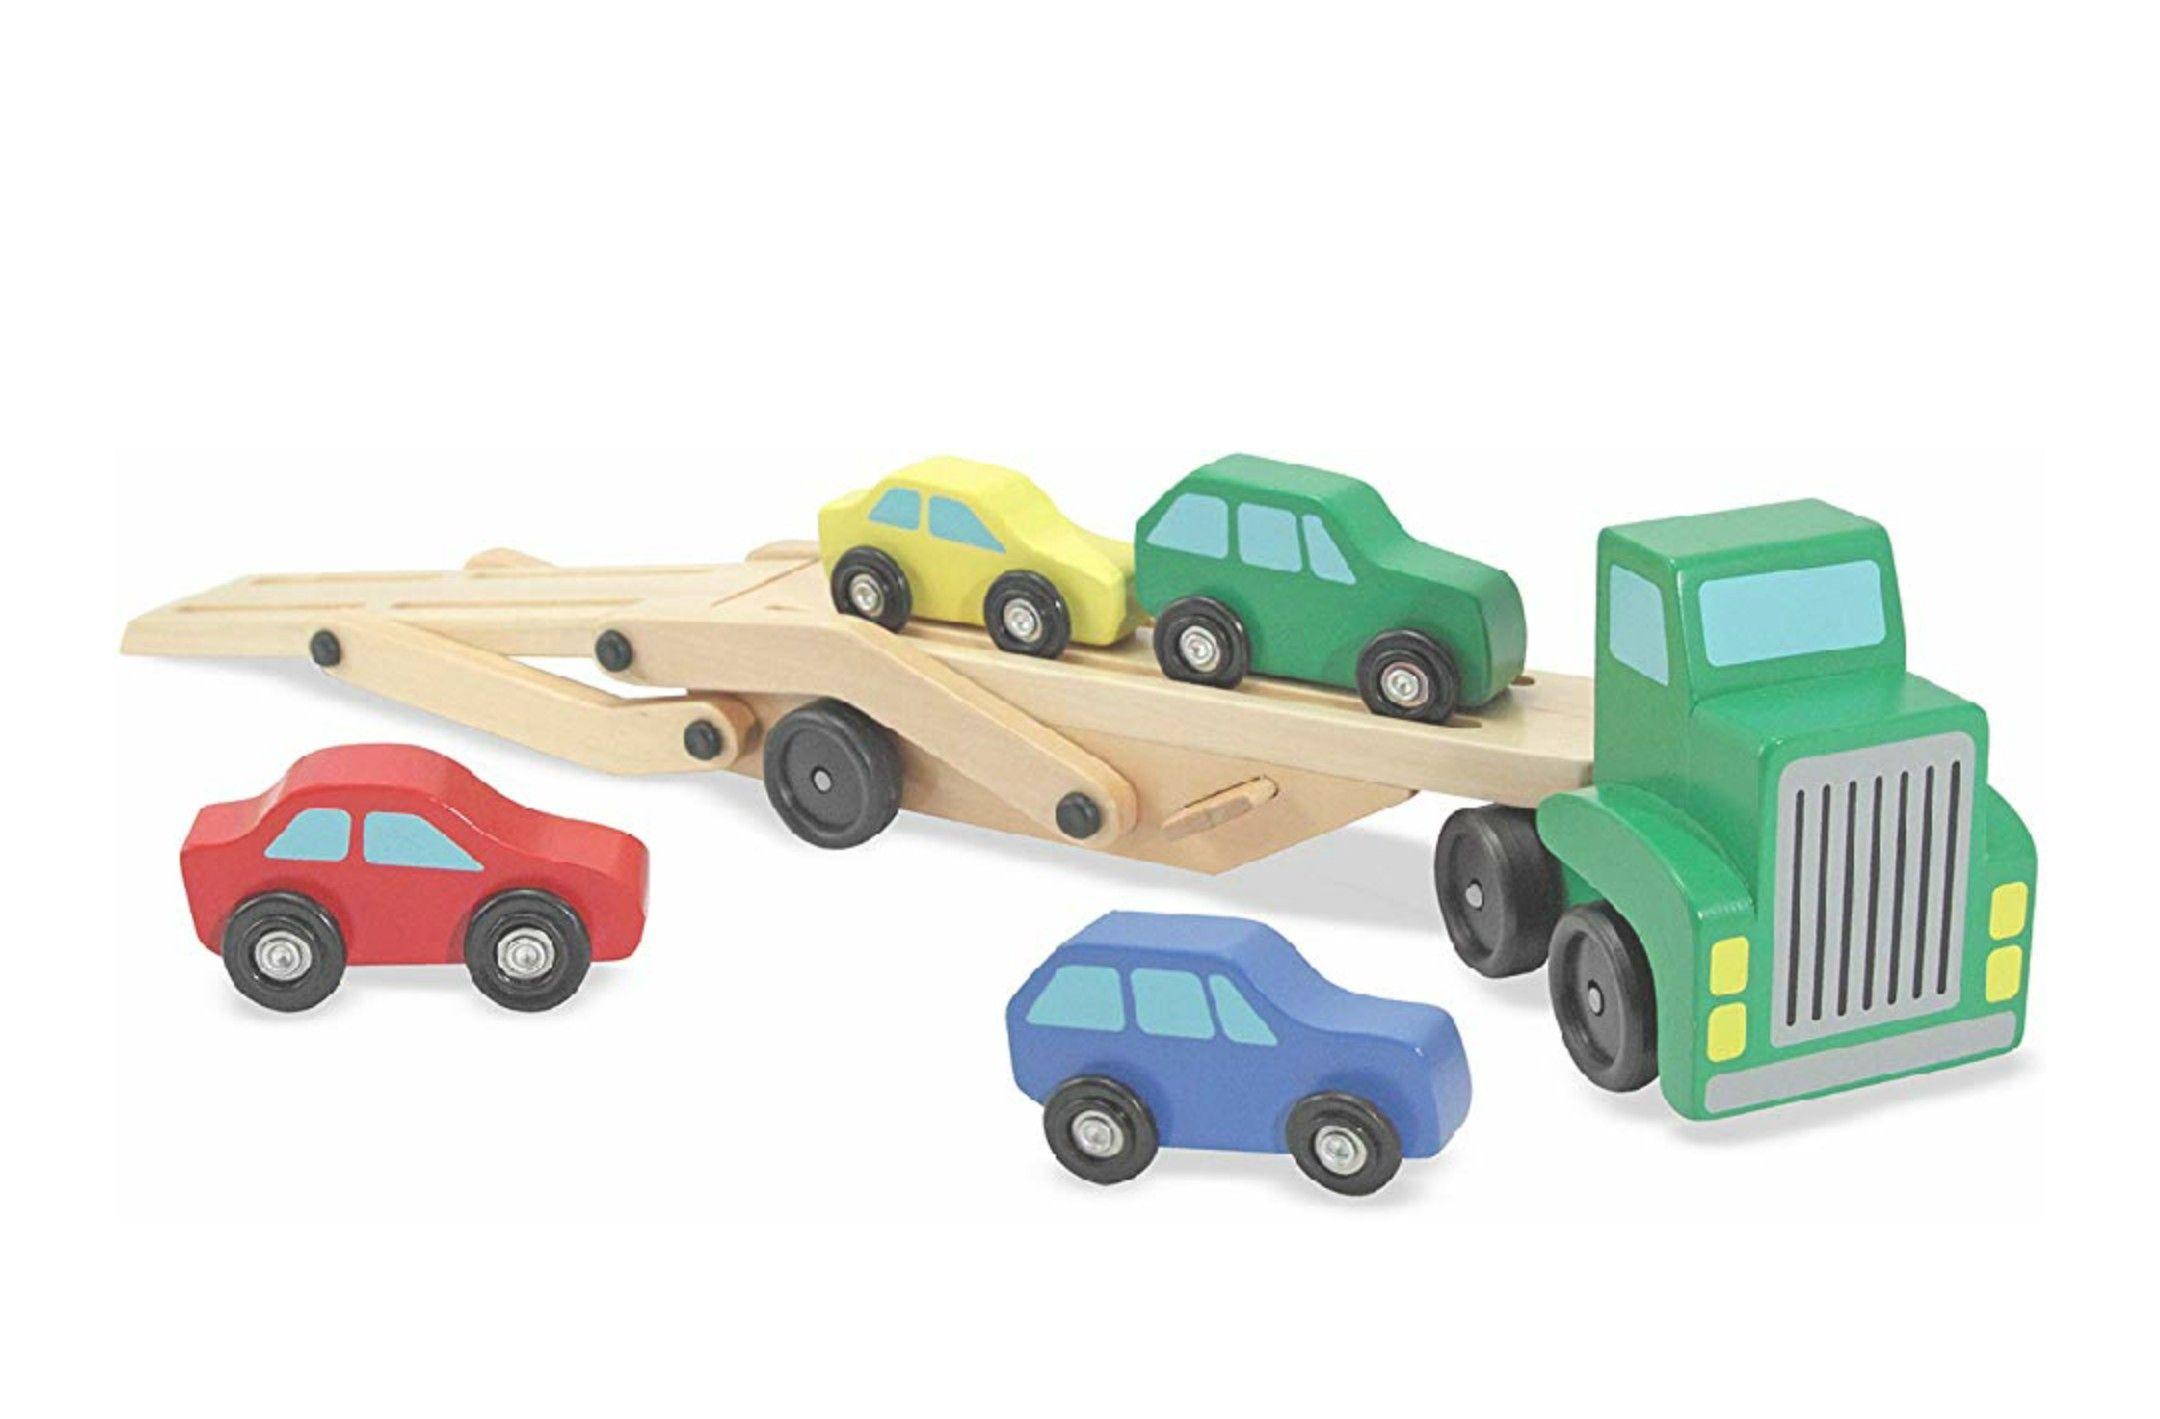 Melissa & Doug Car Transporter Truck & Cars Wooden Toy Set £11.99 Prime / £16.48 Non Prime at Amazon